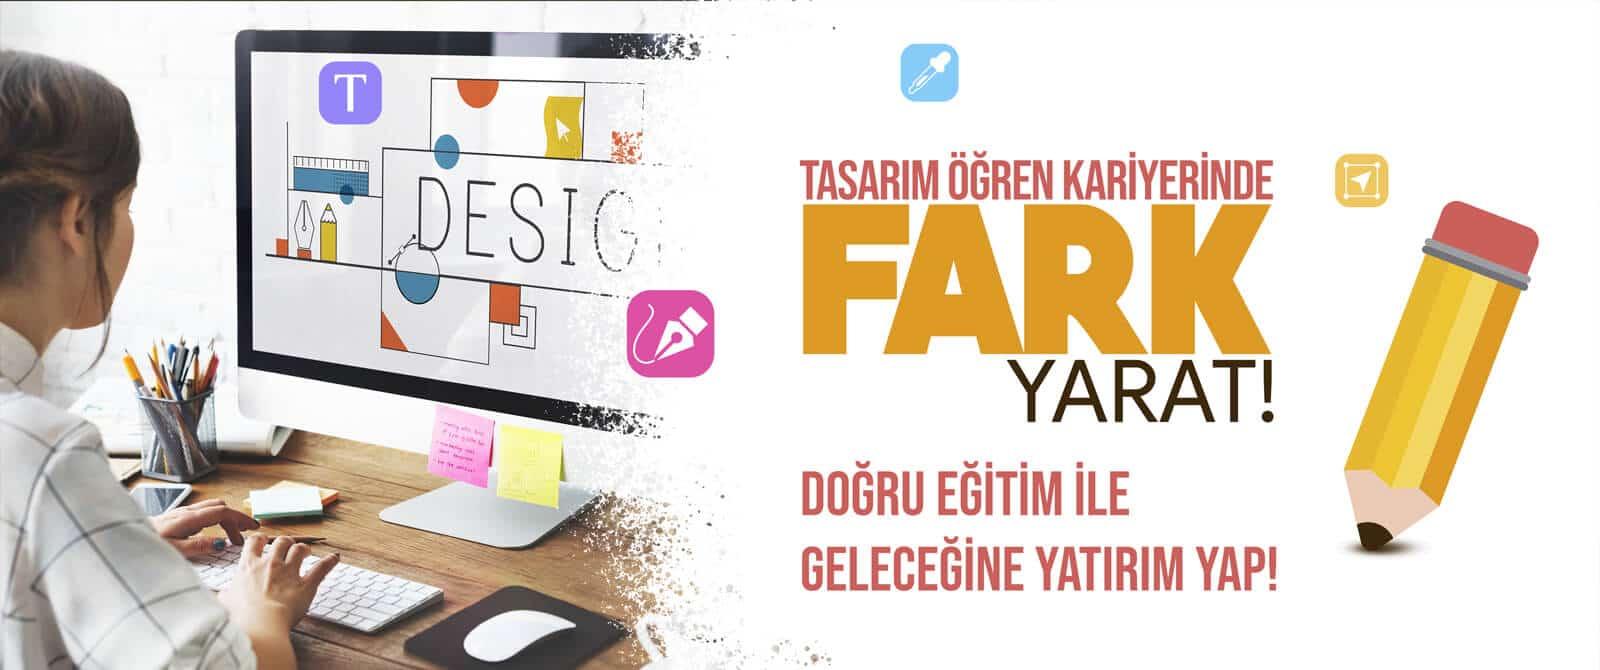 tekstil-desen-tasarim-egitimi